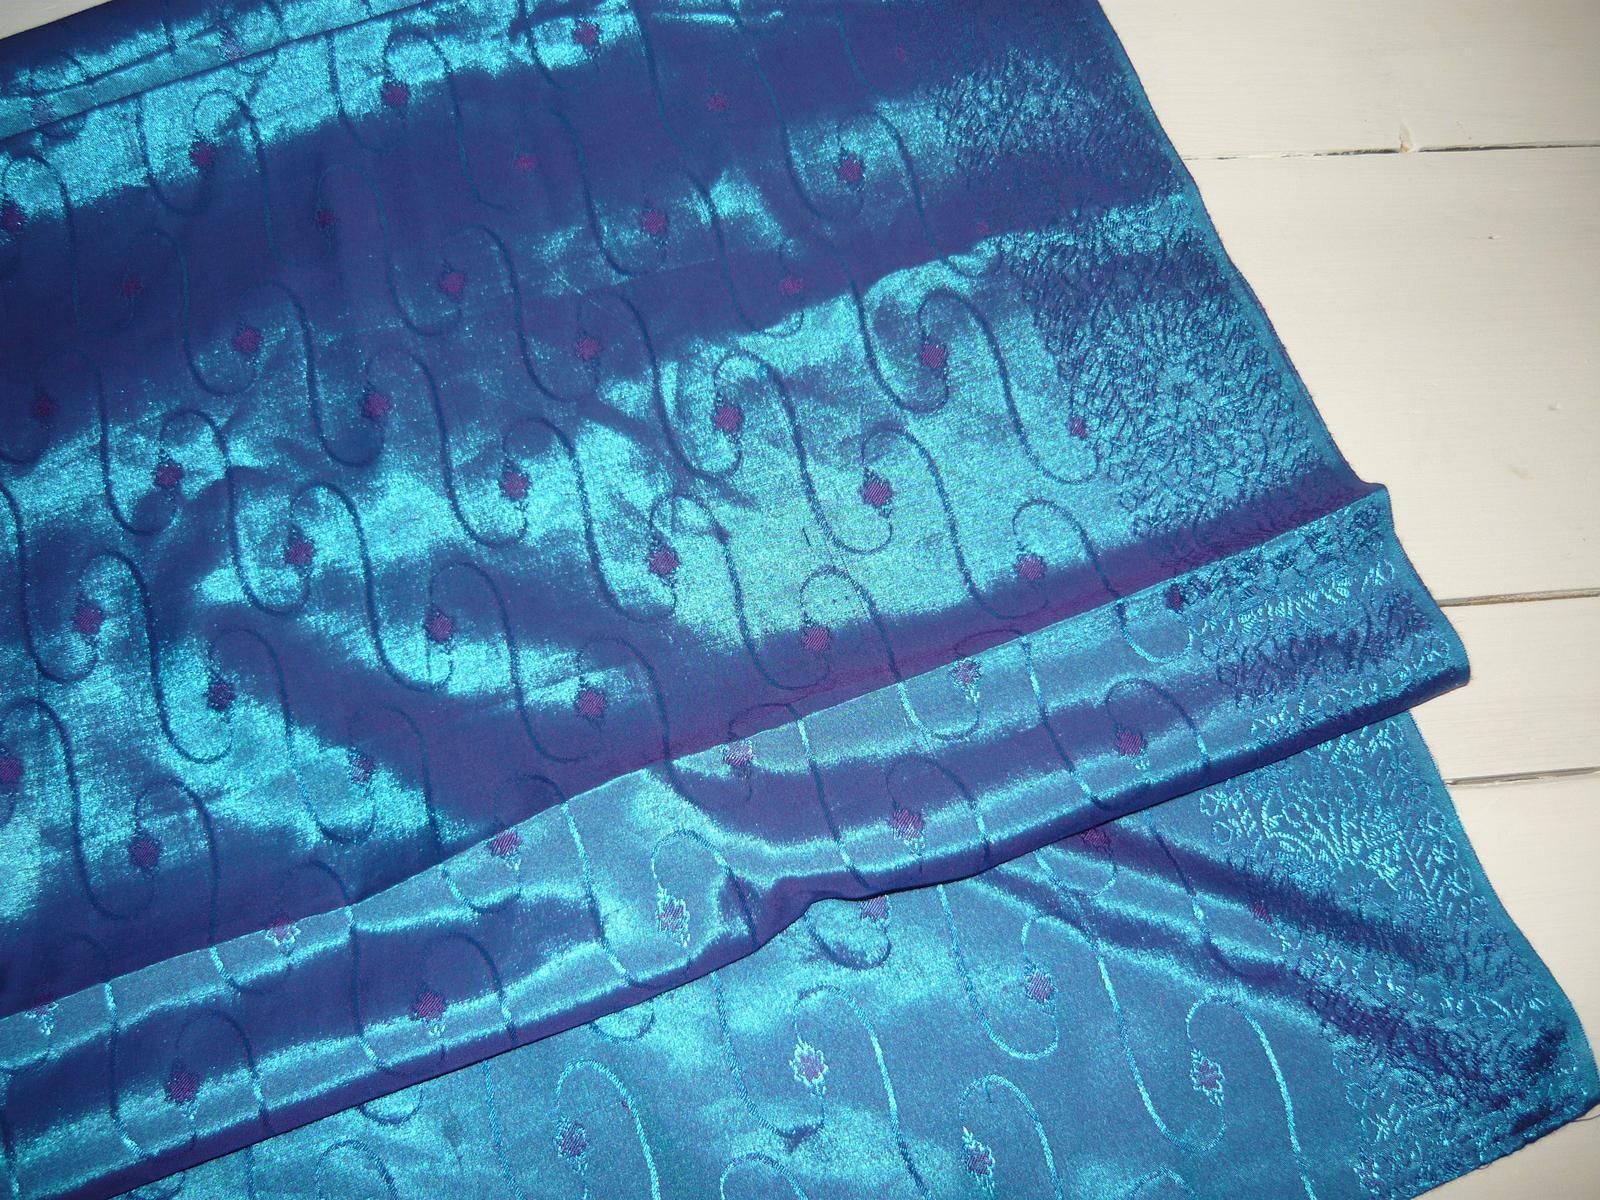 Lesklý modrý obrus  90 x 247 cm - Obrázok č. 1